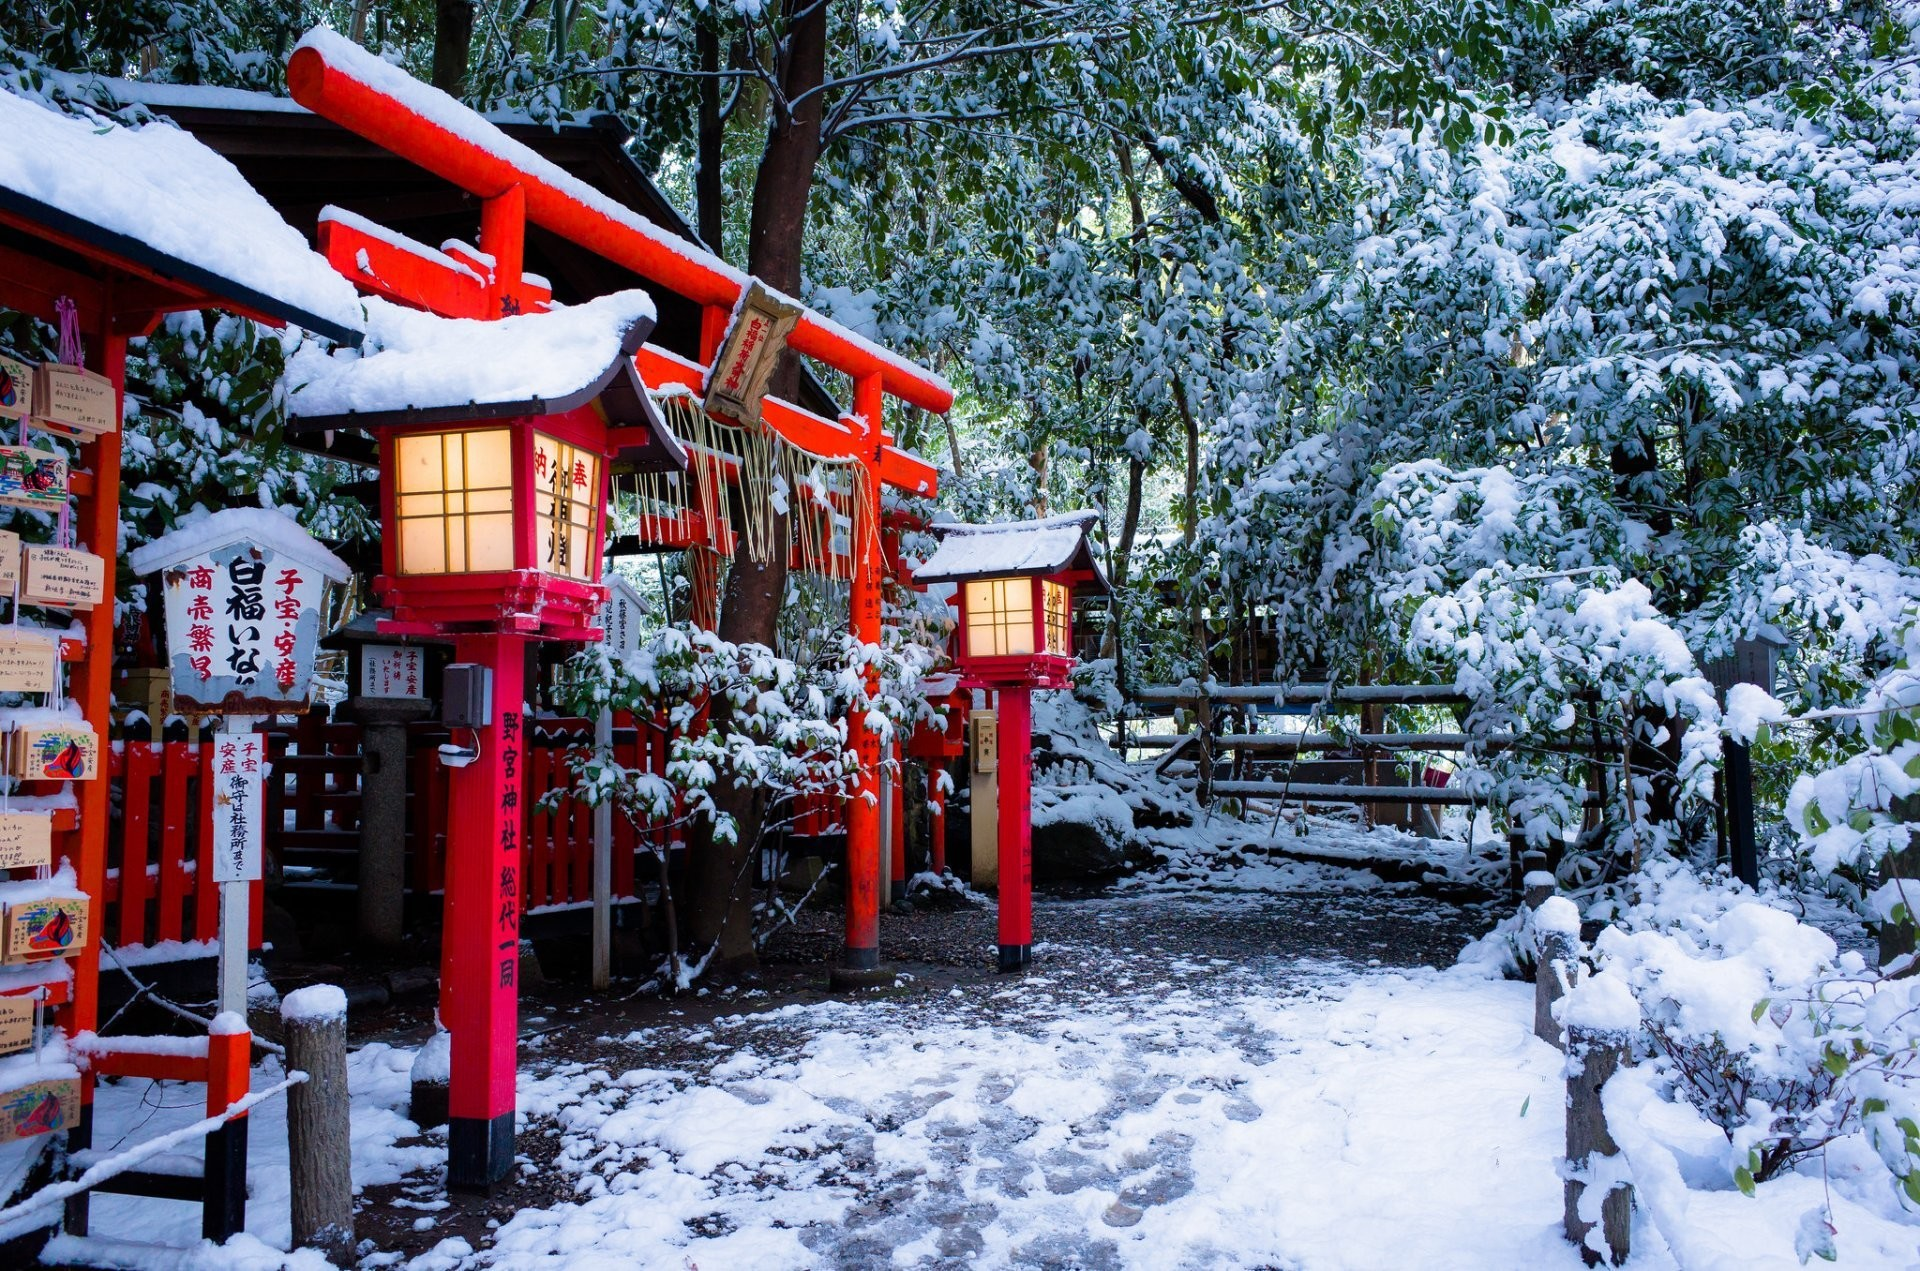 nonomiya shrine torii gate kyoto japan temple nonomiya torii kyoto japan  temple gate lamps winter snow